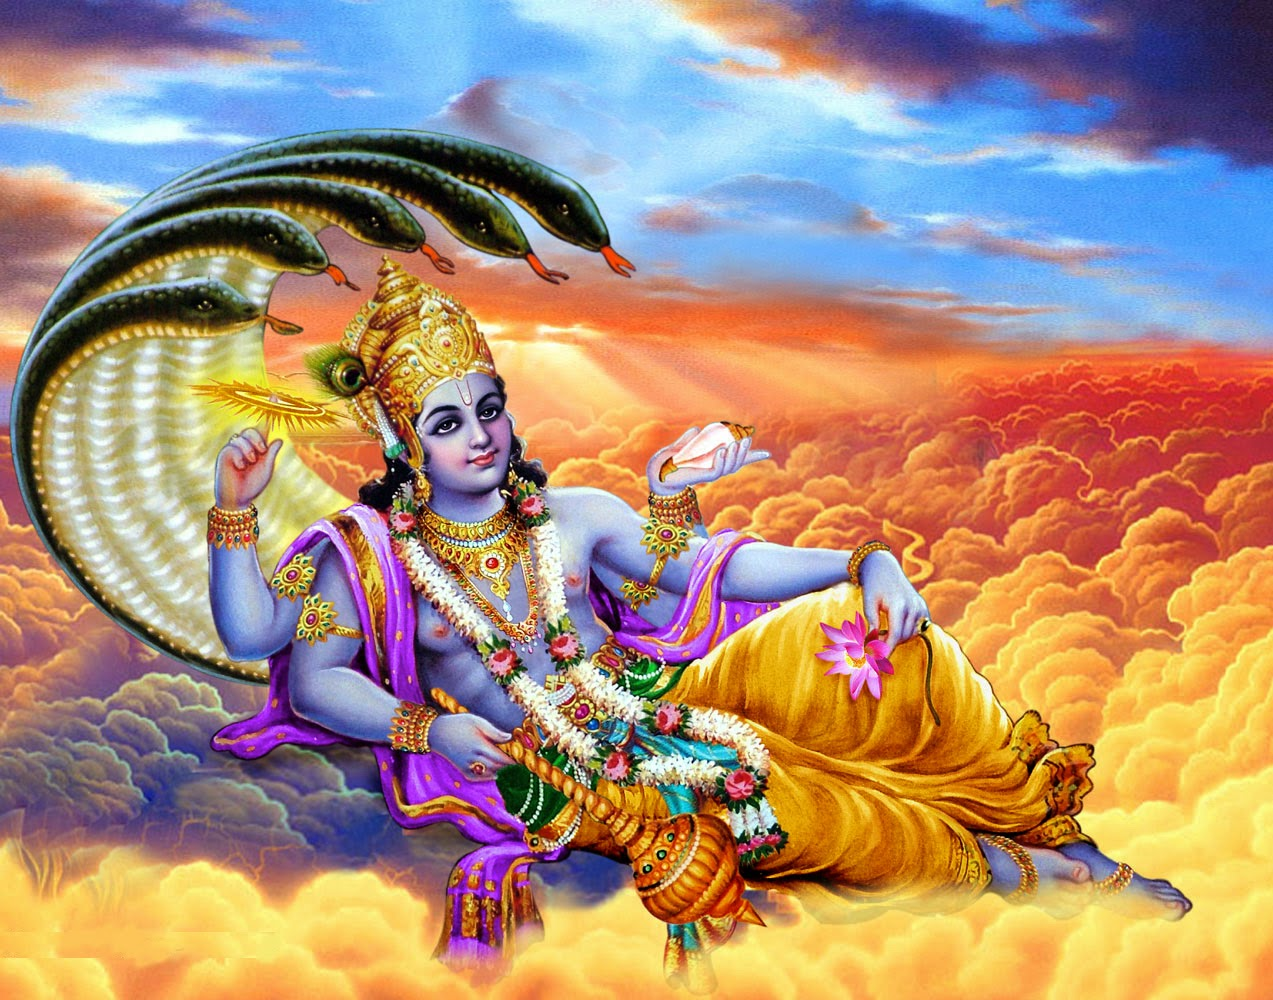 Mythological story of Vishnu and Parvti